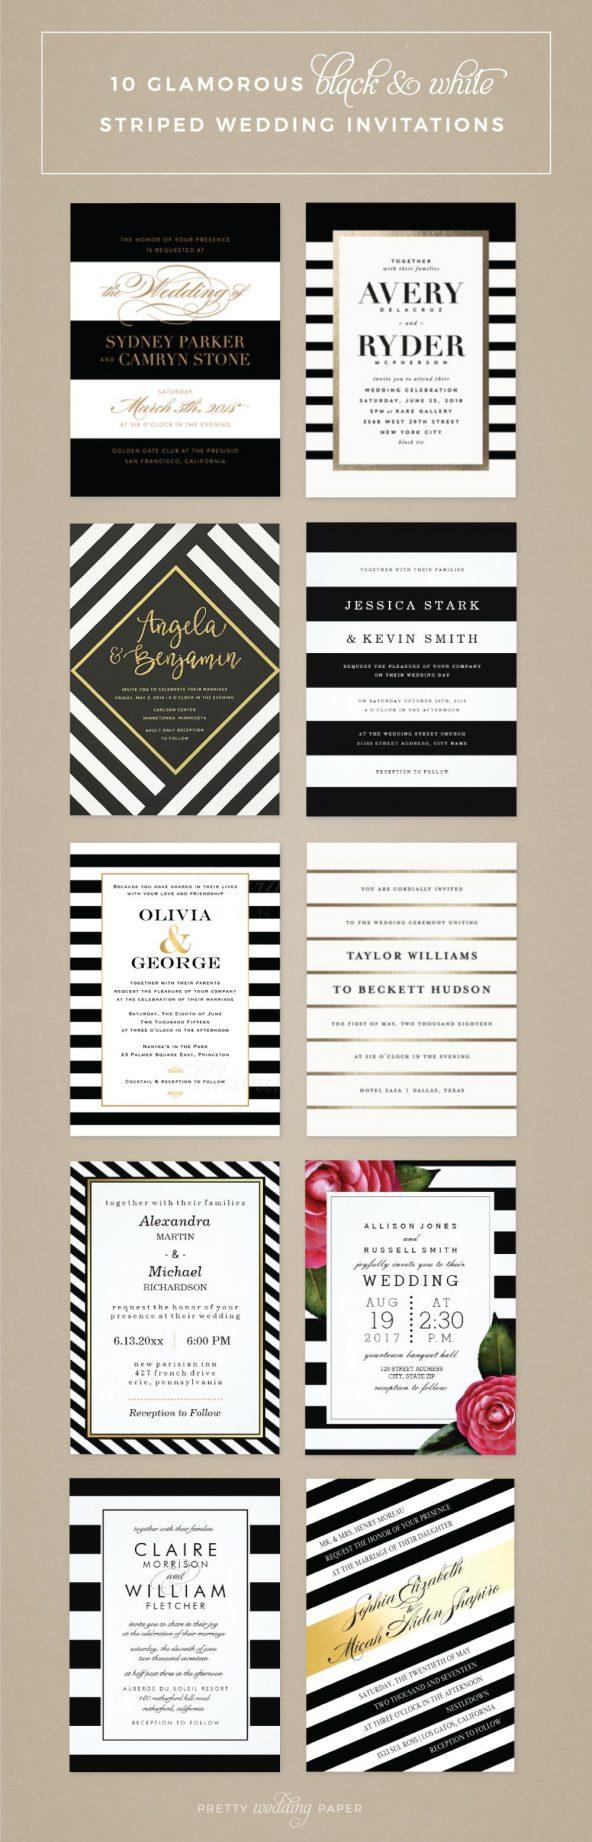 Wedding Invitations Wedding Paper Divas Pretty Wedding Paper Wedding Invitation Ideas Inspiration